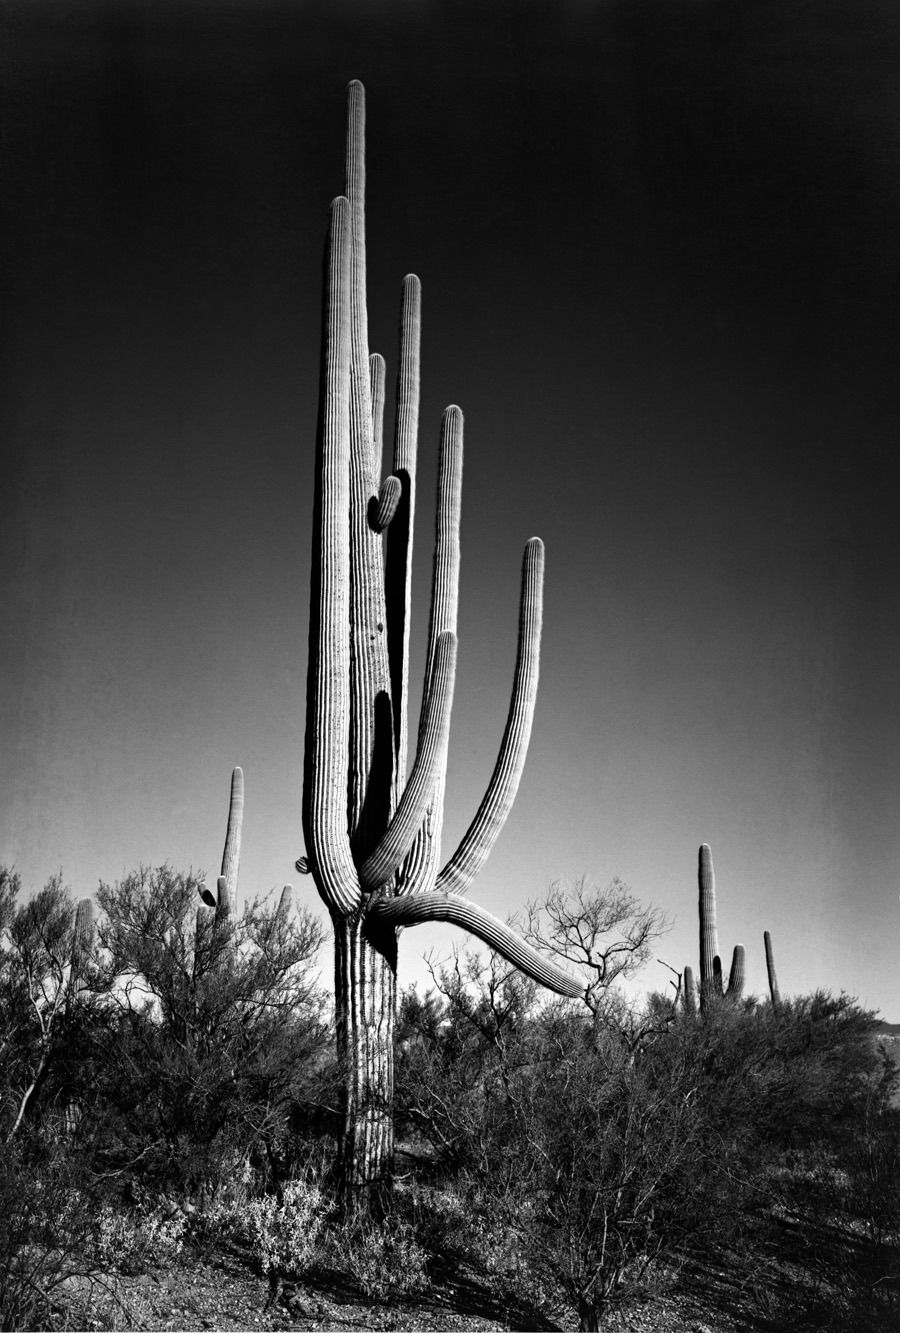 Photography by Ansel Adams | ansel adams 3 « Oscar en Fotos ...